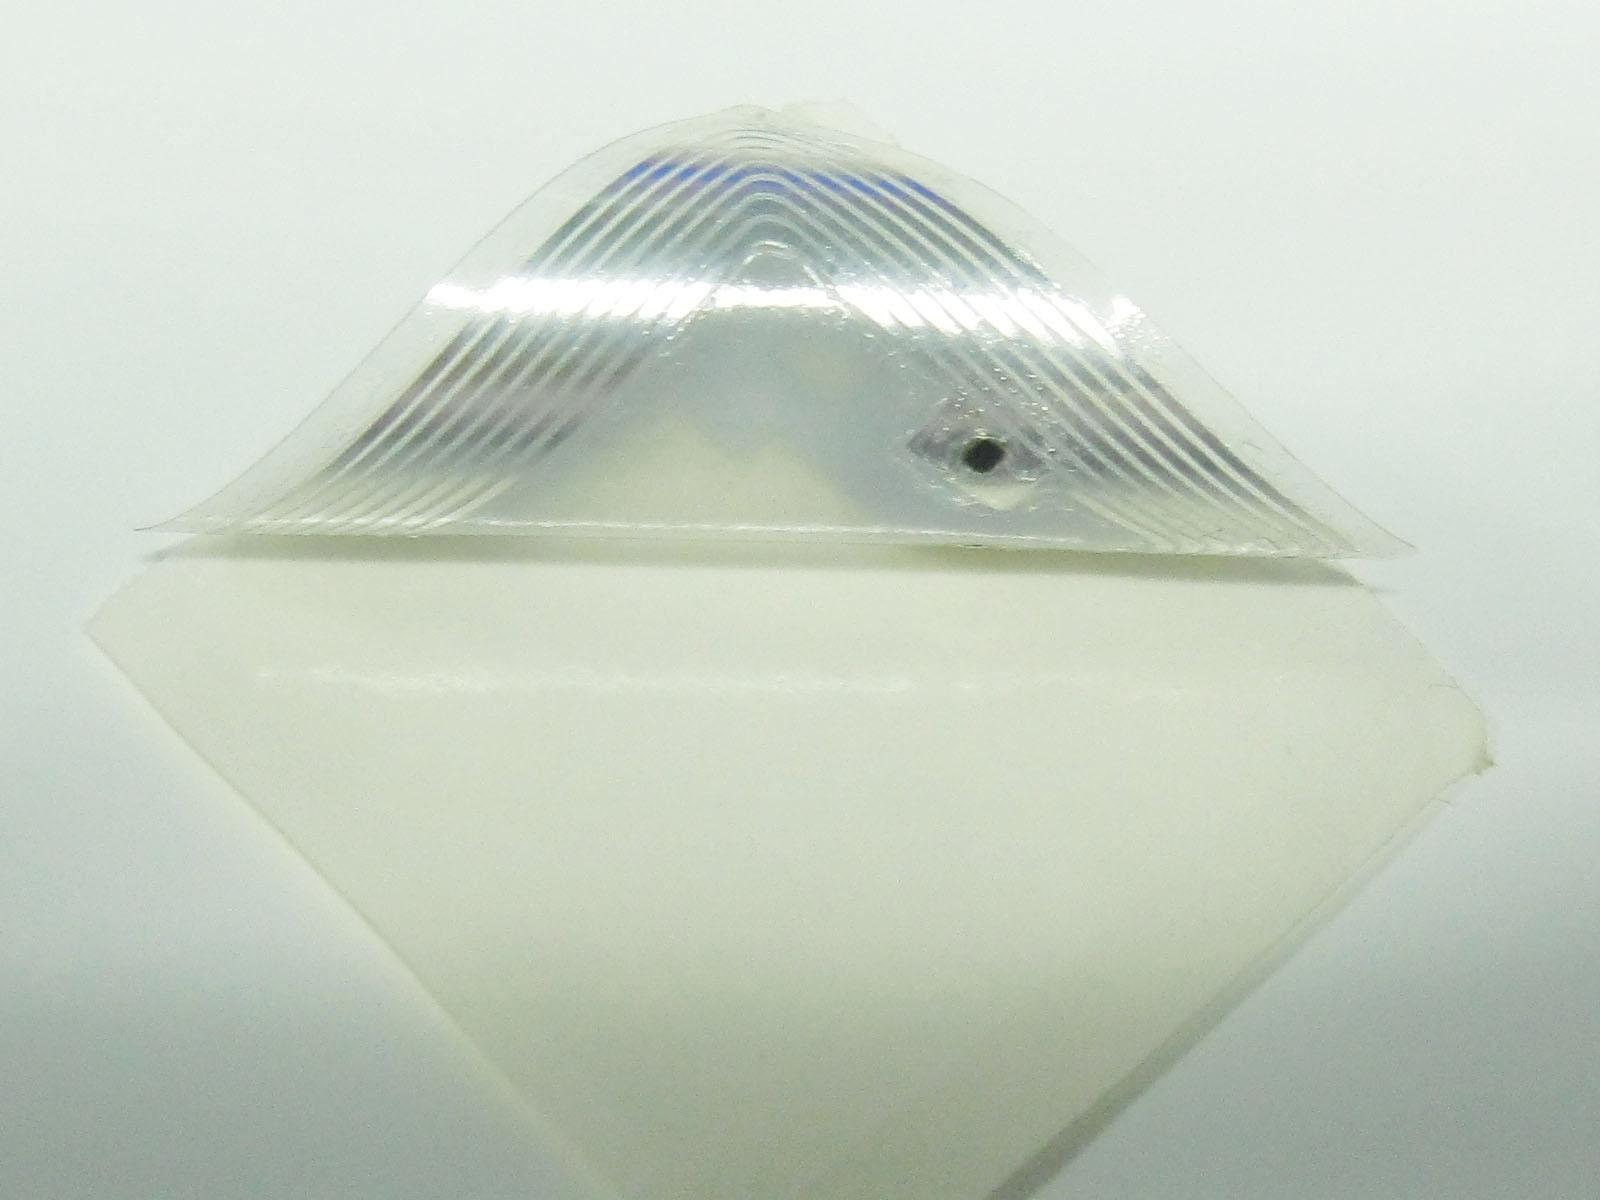 Aluminum - Lifting an NFC tag reveals the aluminum antenna and NFC chip